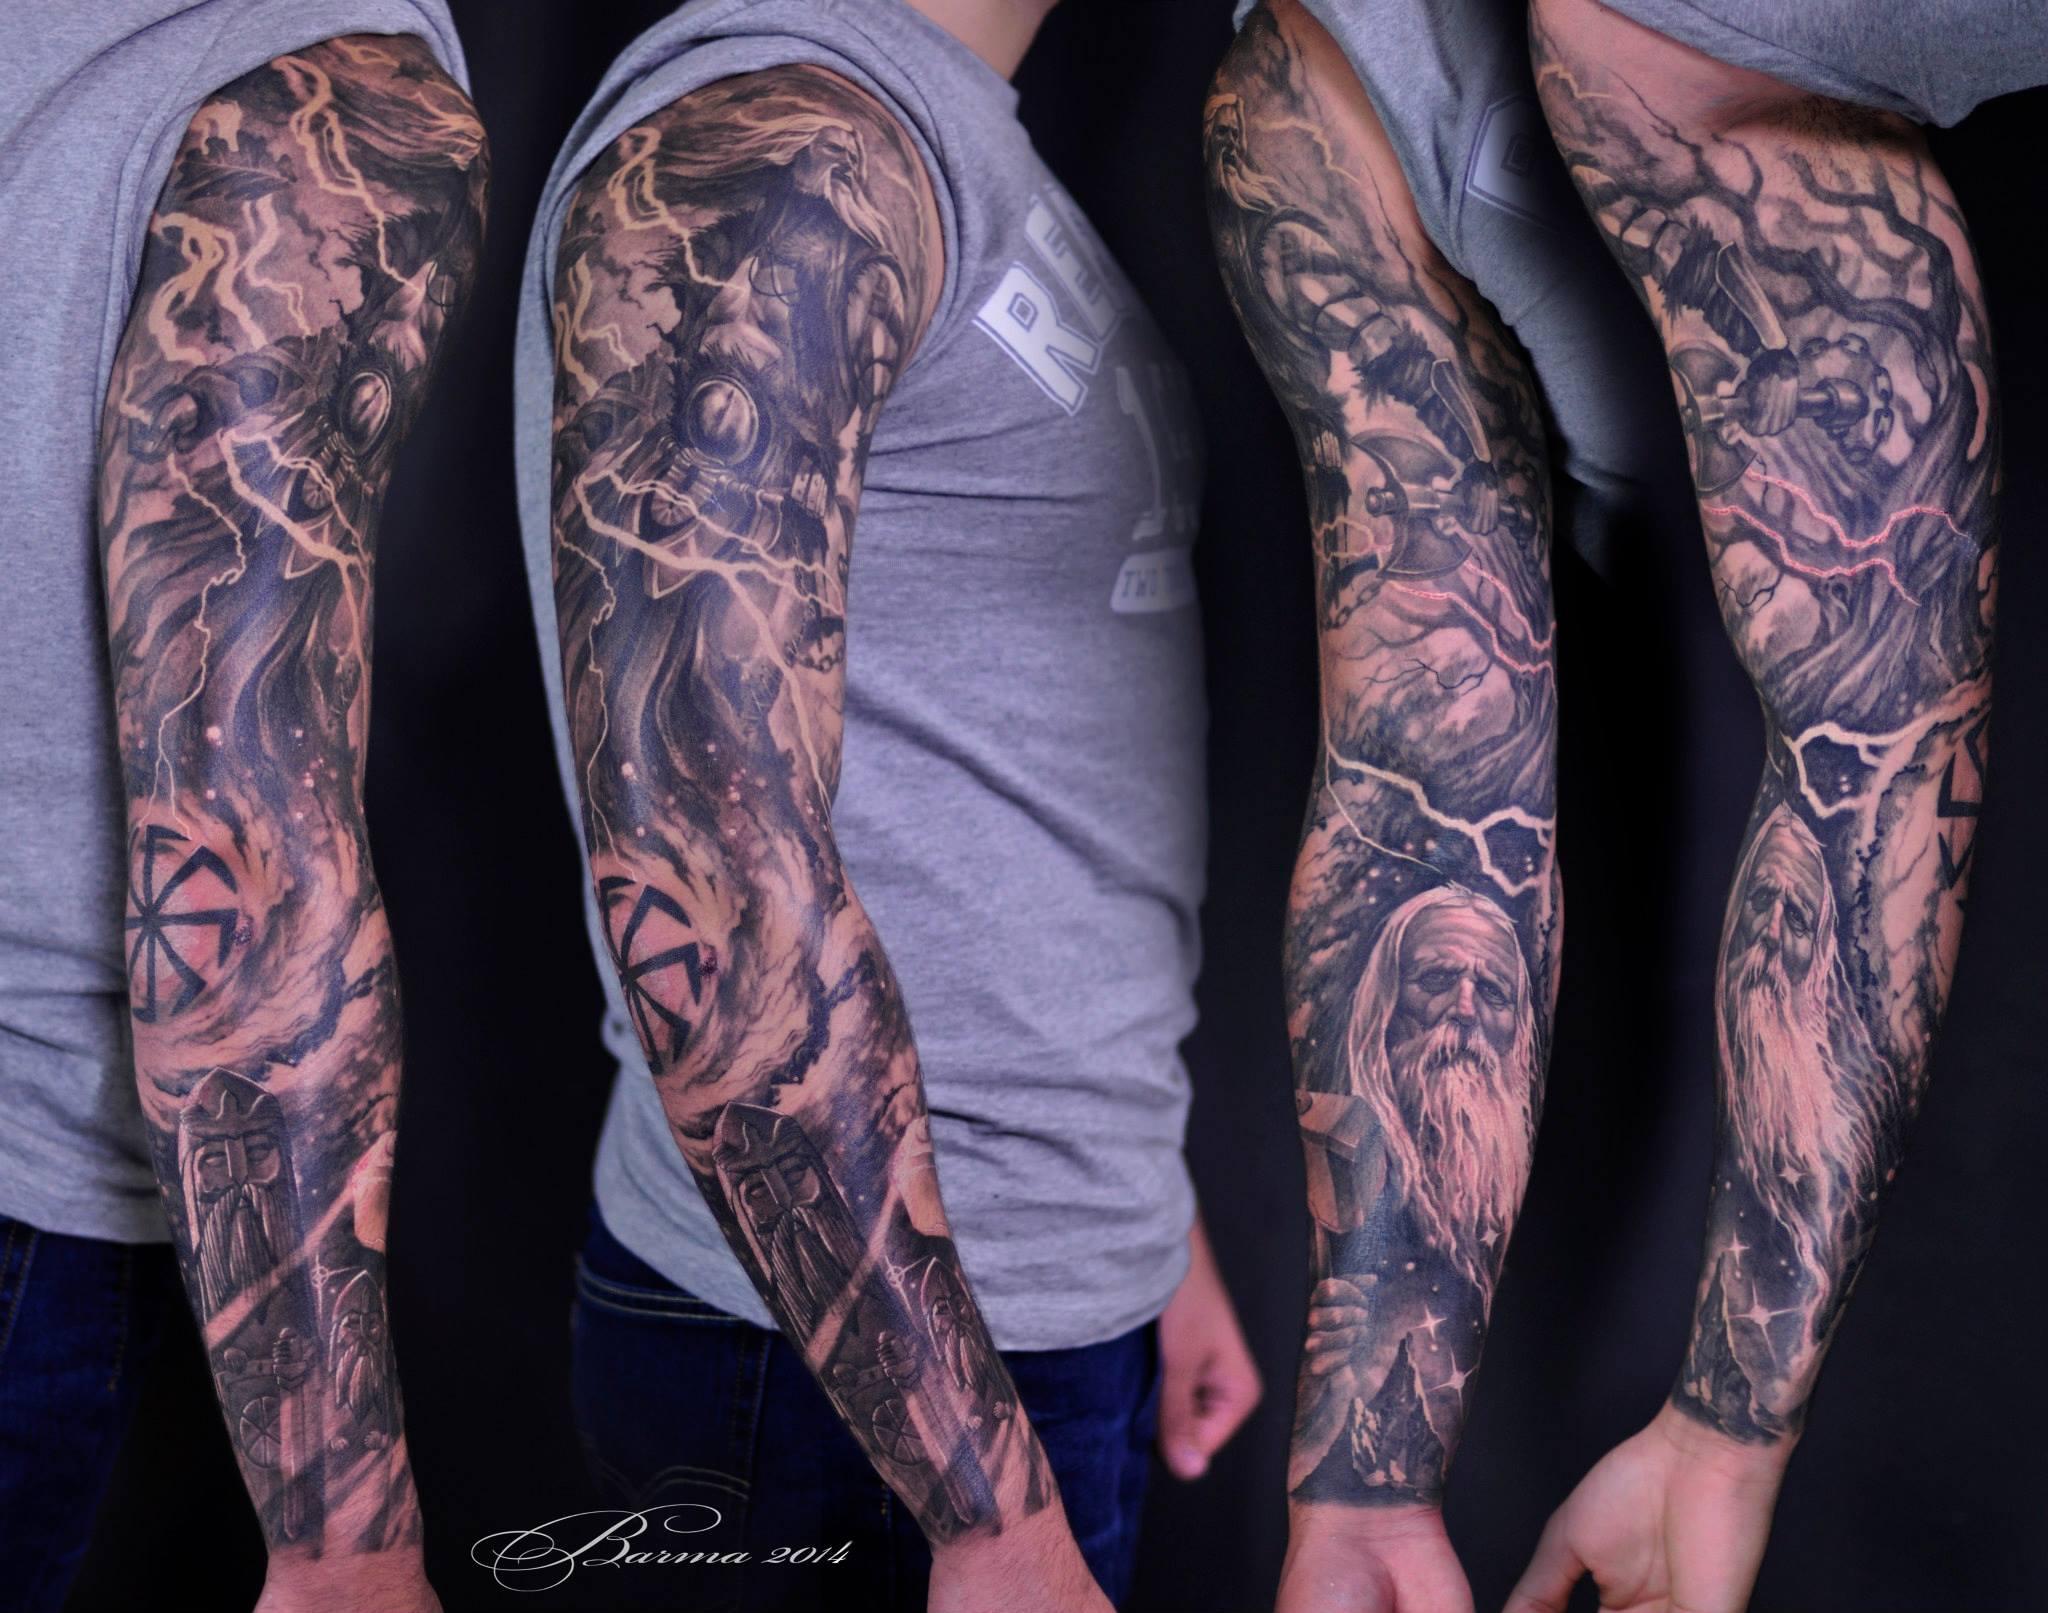 Slavic and Viking theme full sleeve tattoo